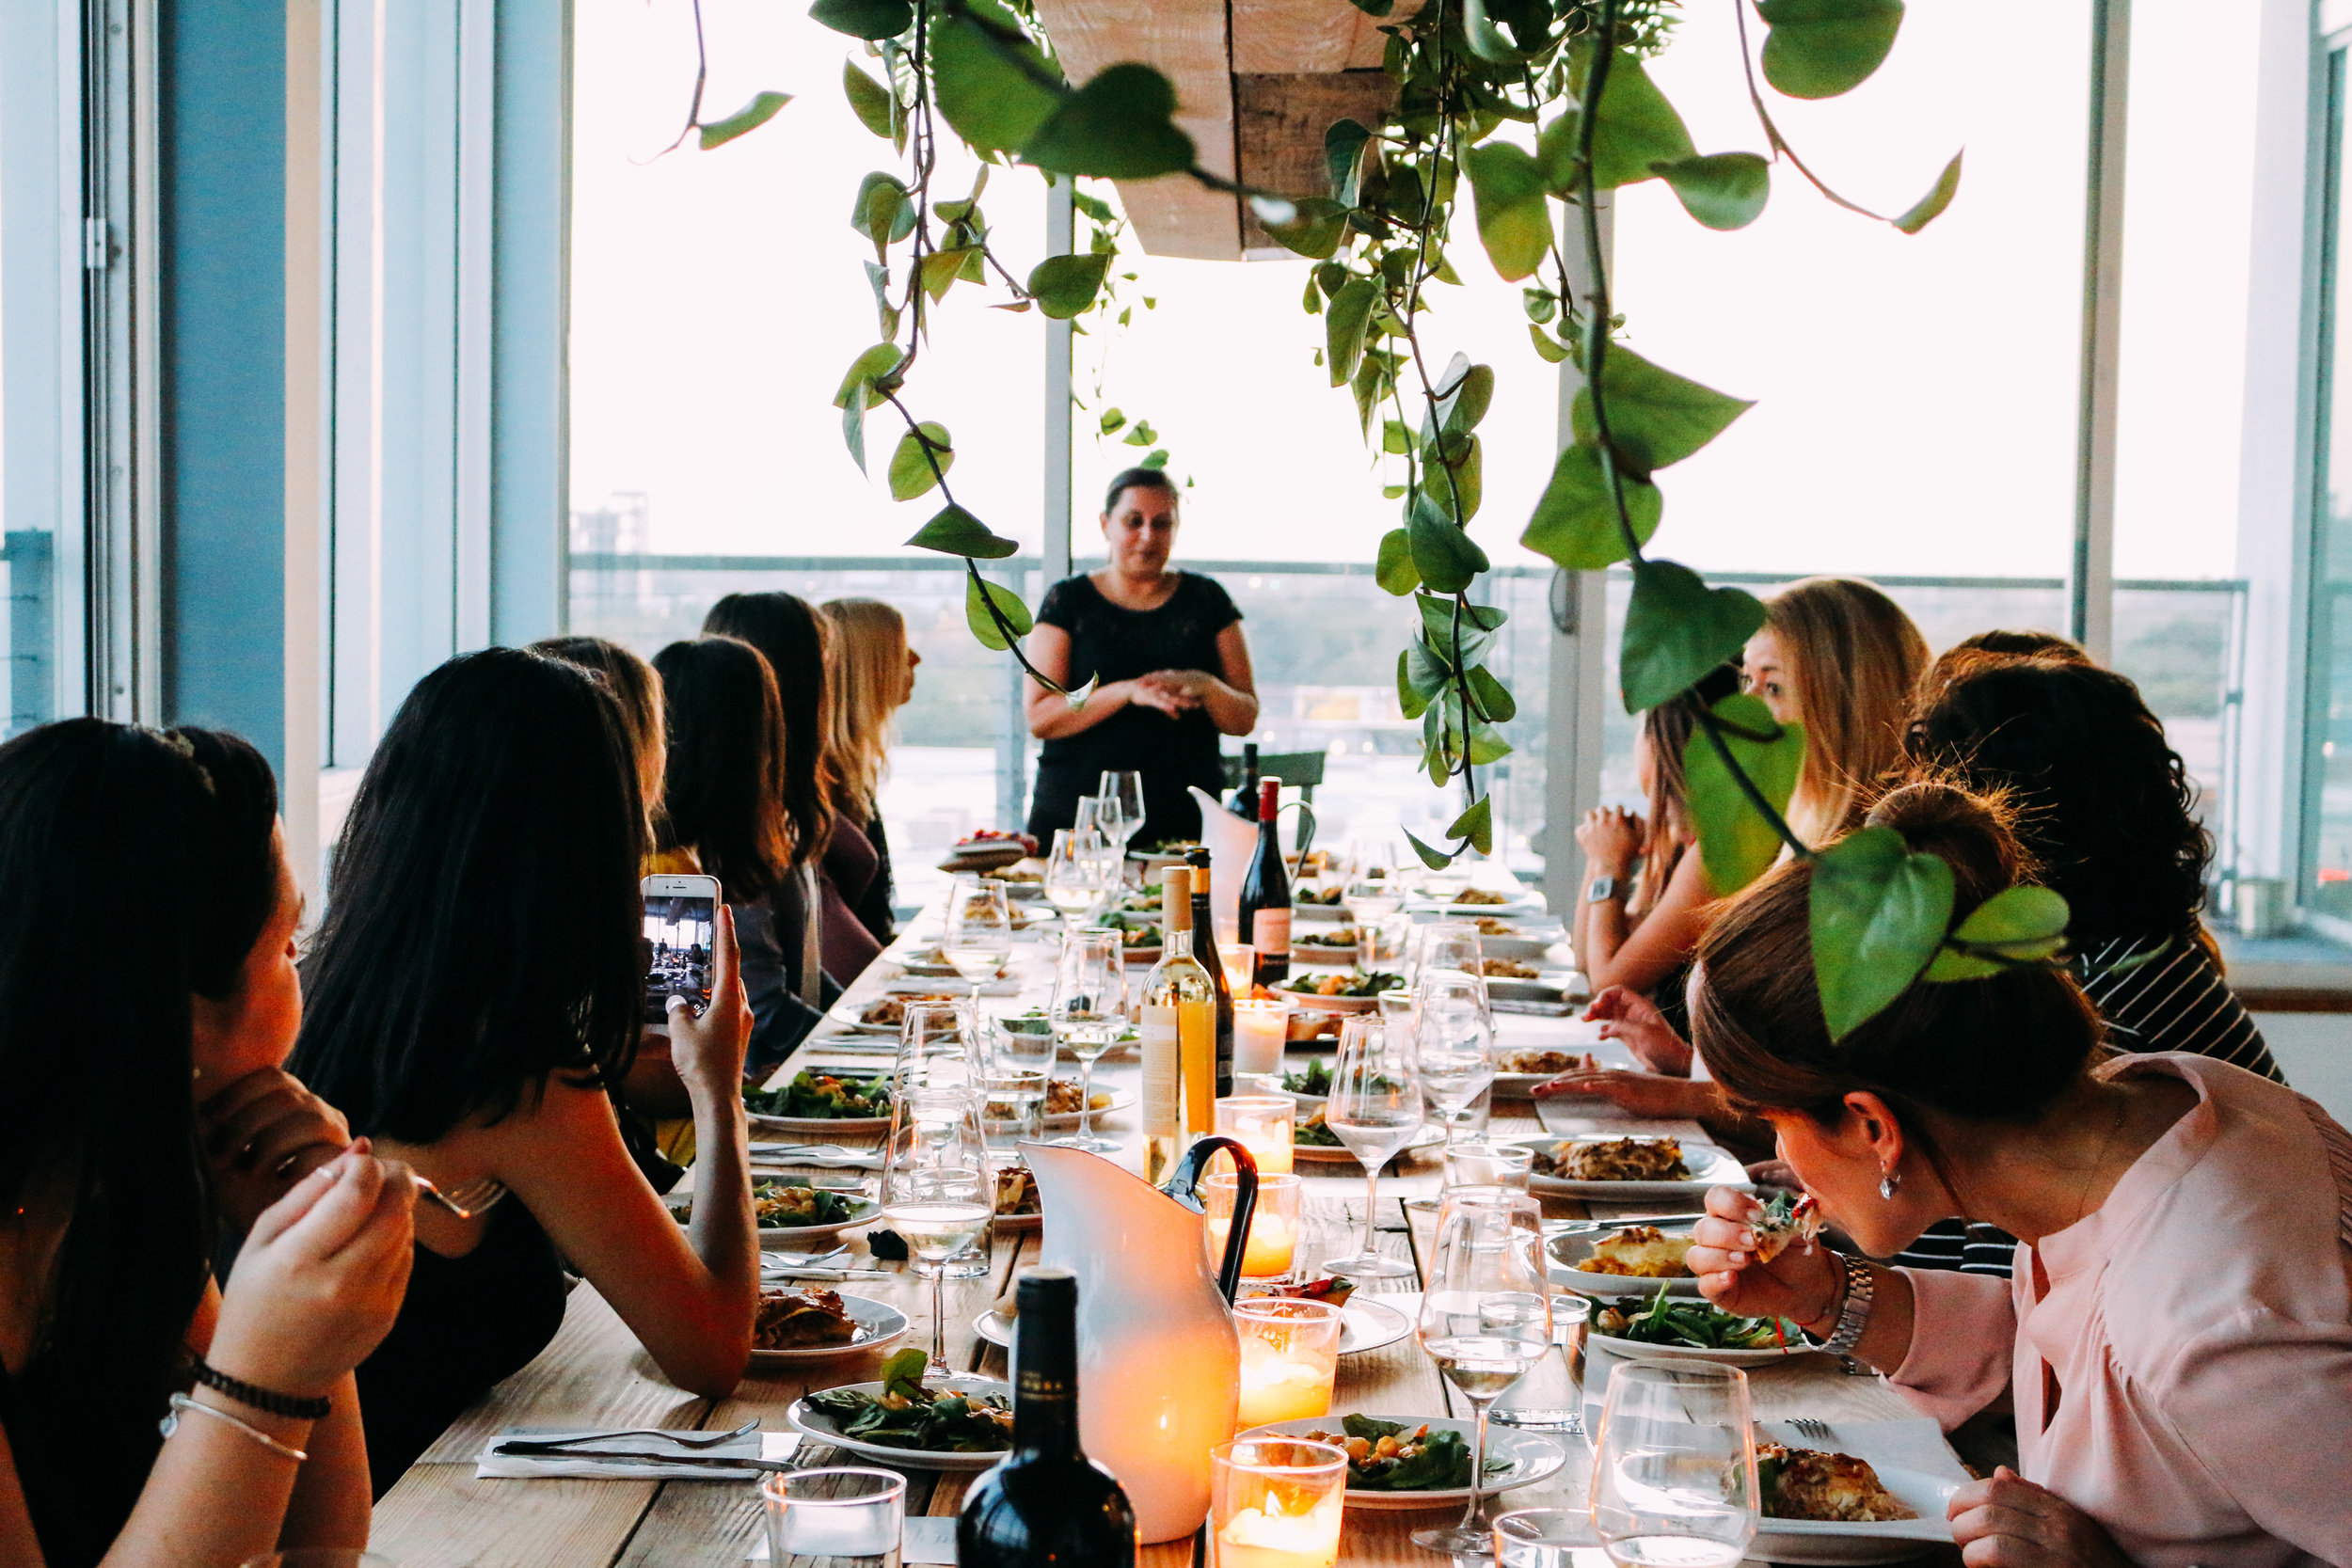 Women Who Wine Uncorked Conversations-Miami Wine Events-Wine Tasting Miami-59.jpg